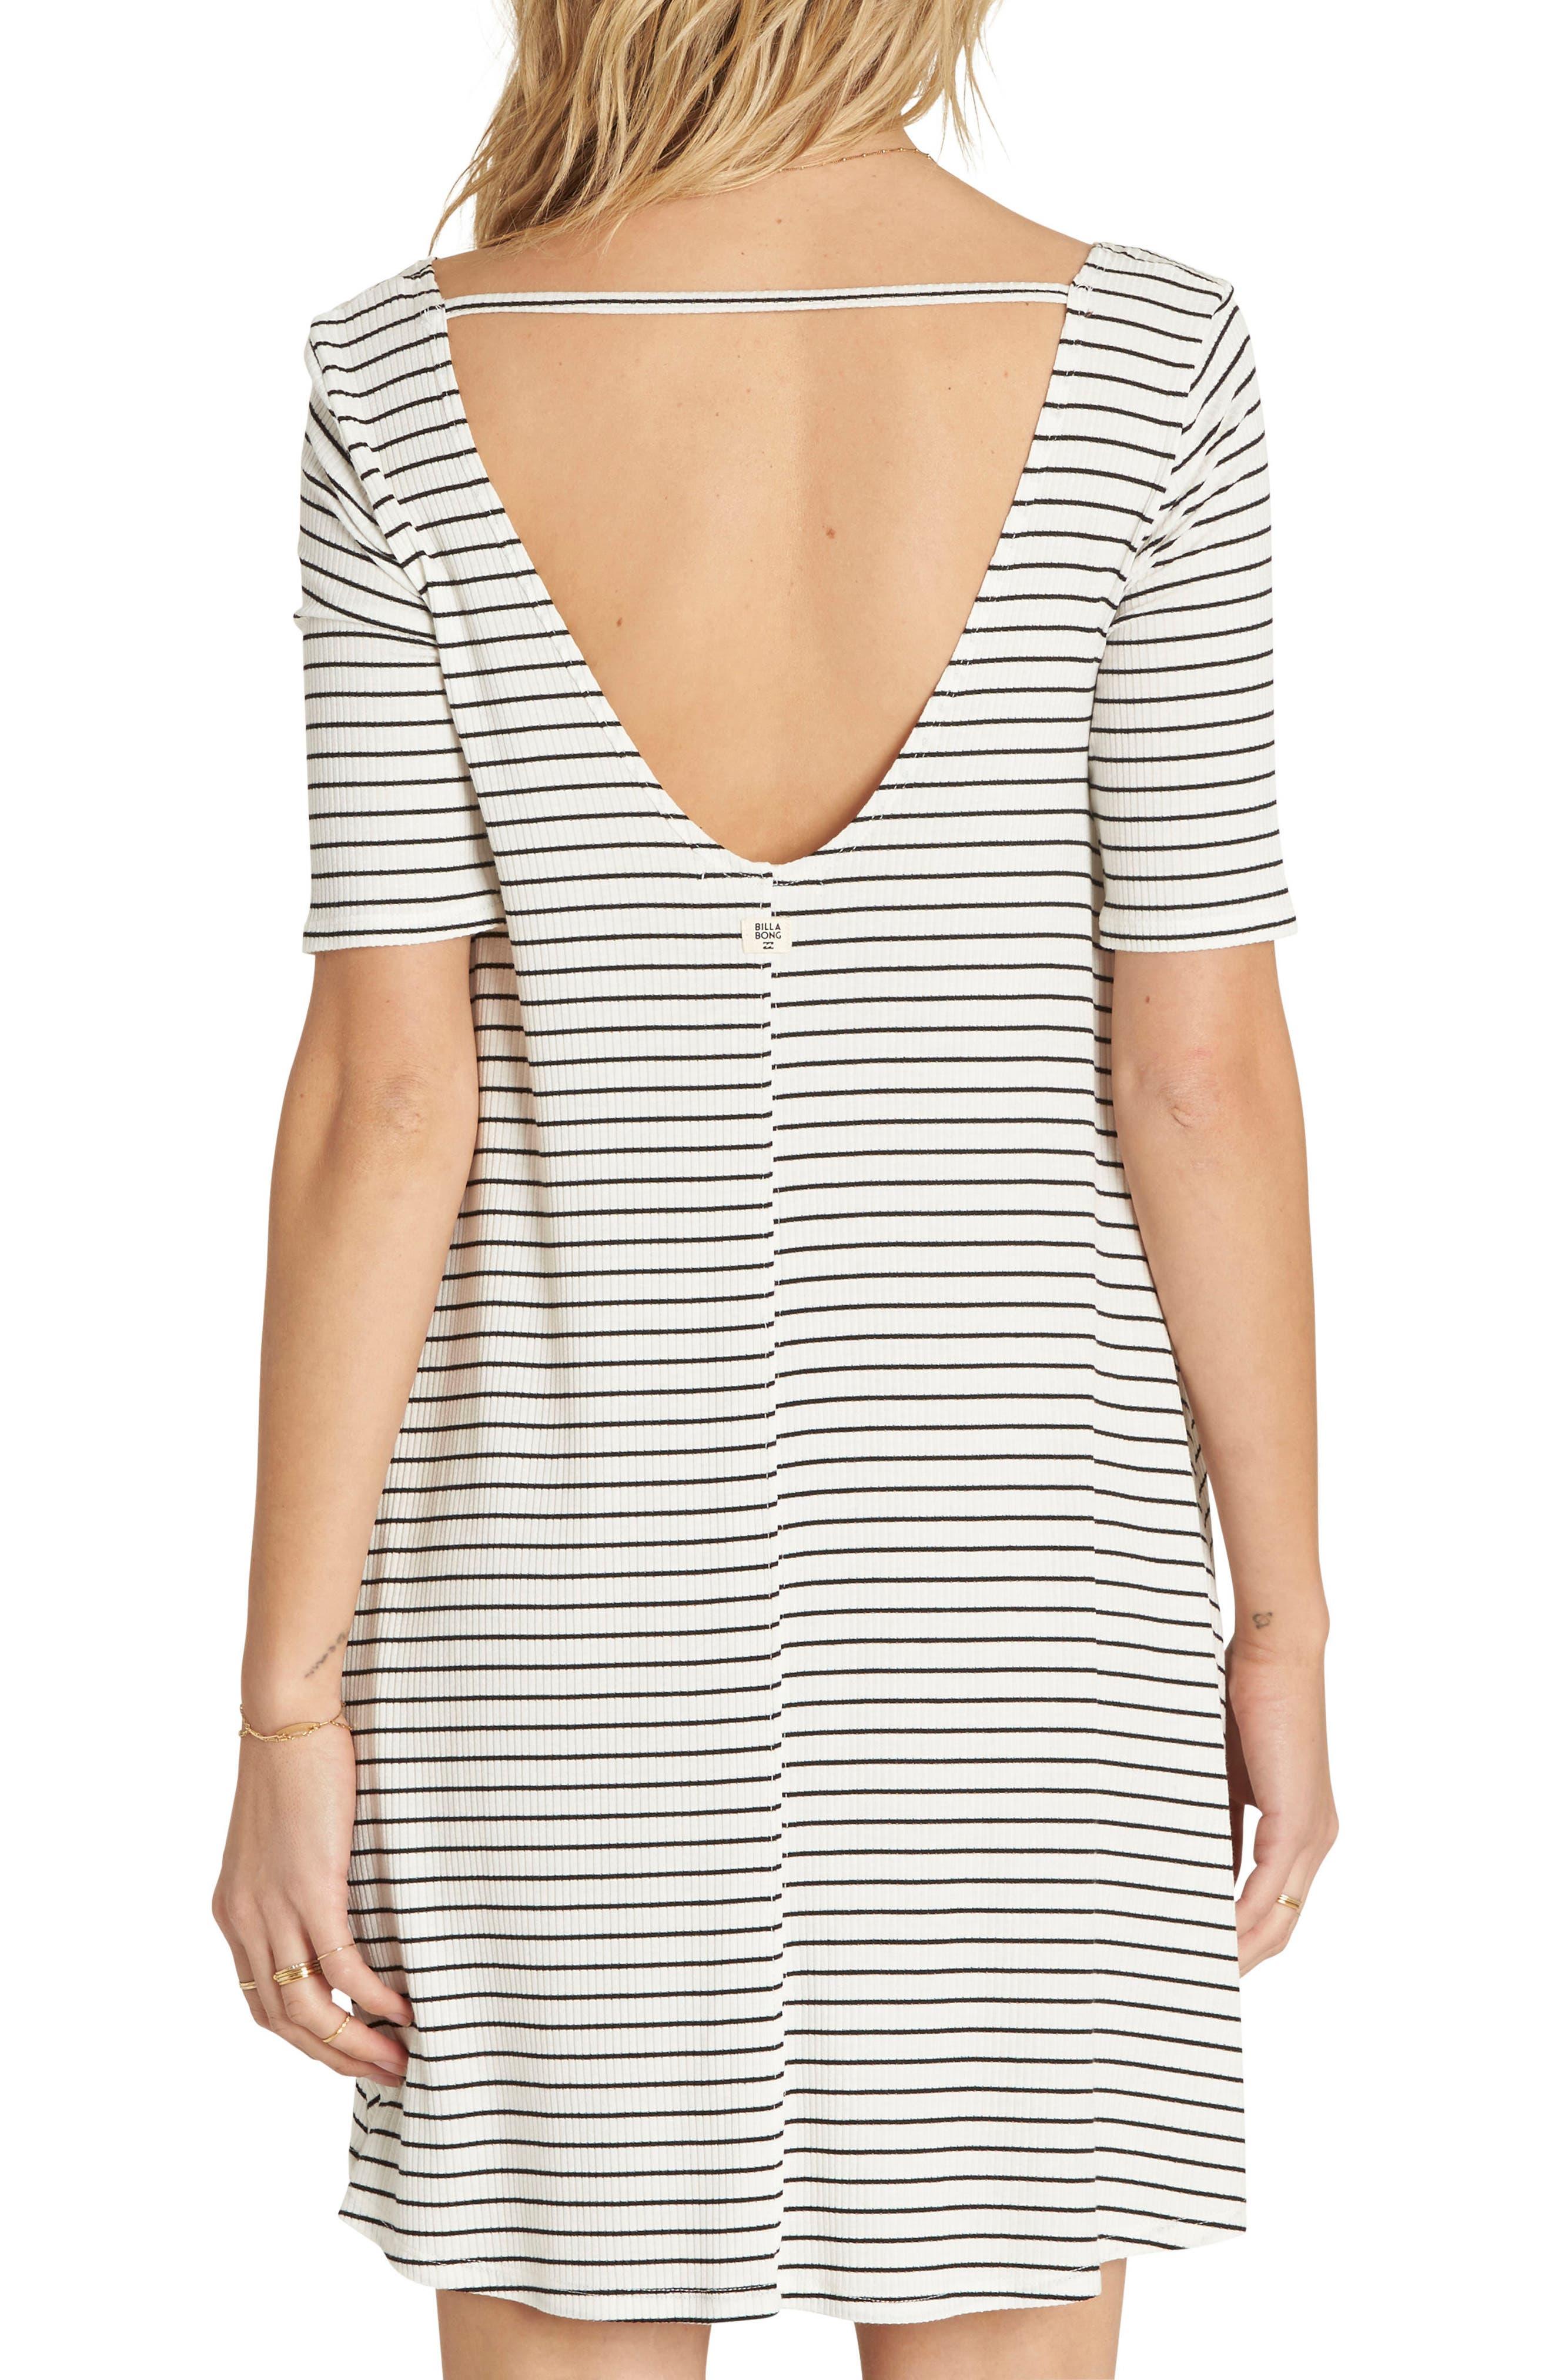 Alternate Image 2  - Billabong Nothing to Hide Ribbed T-Shirt Dress